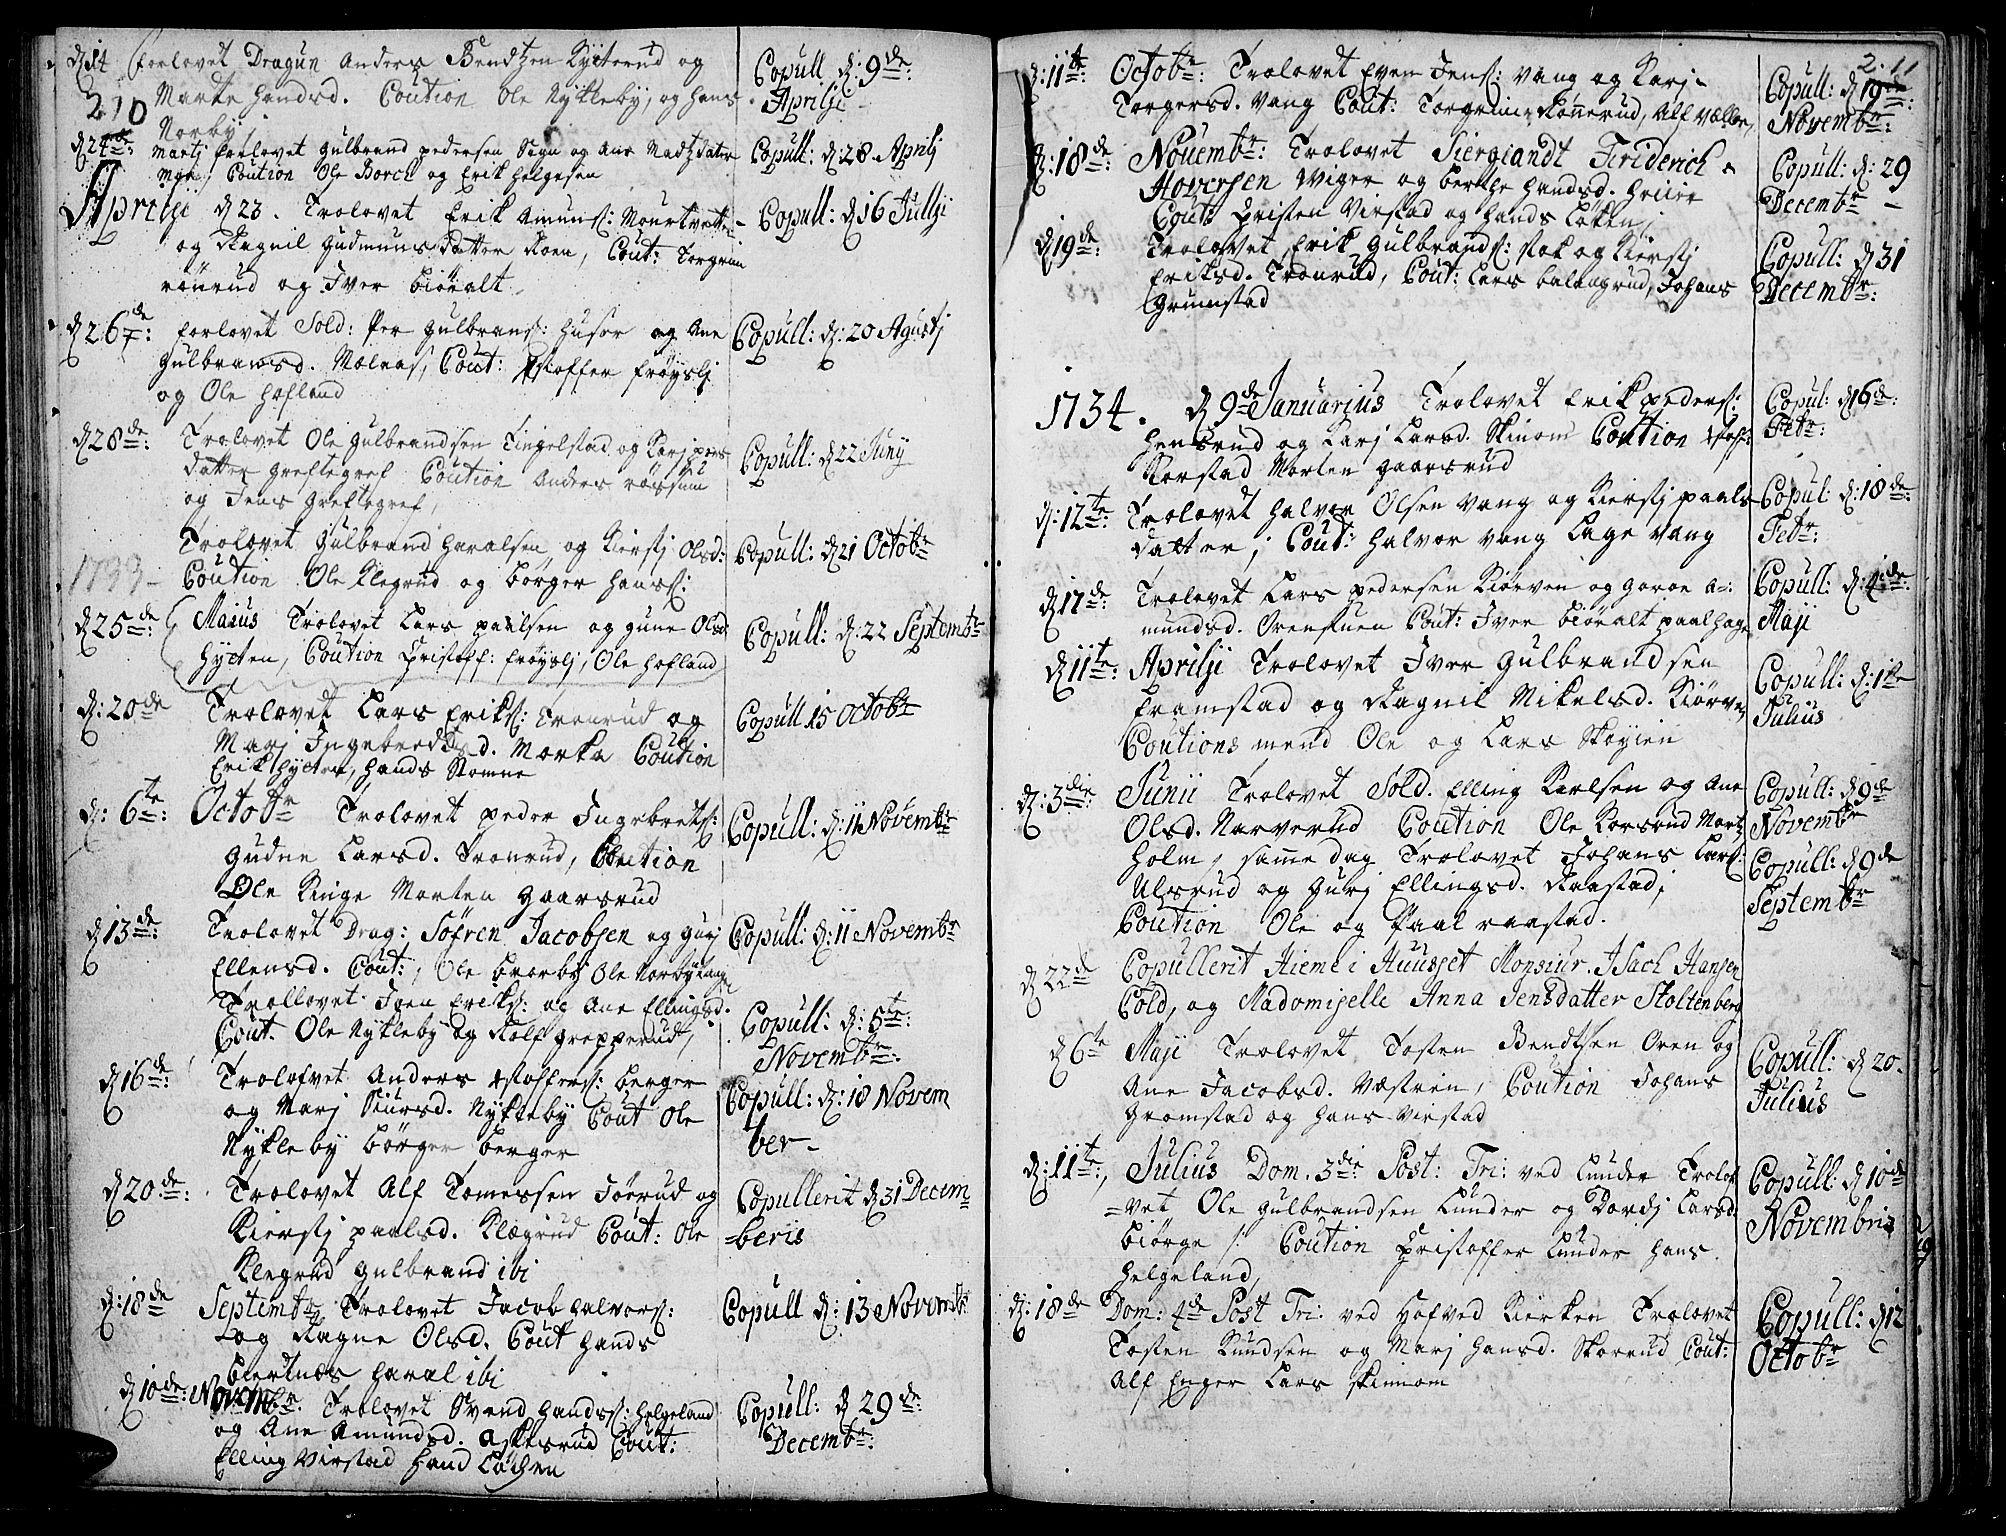 SAH, Jevnaker prestekontor, Ministerialbok nr. 2, 1725-1751, s. 210-211